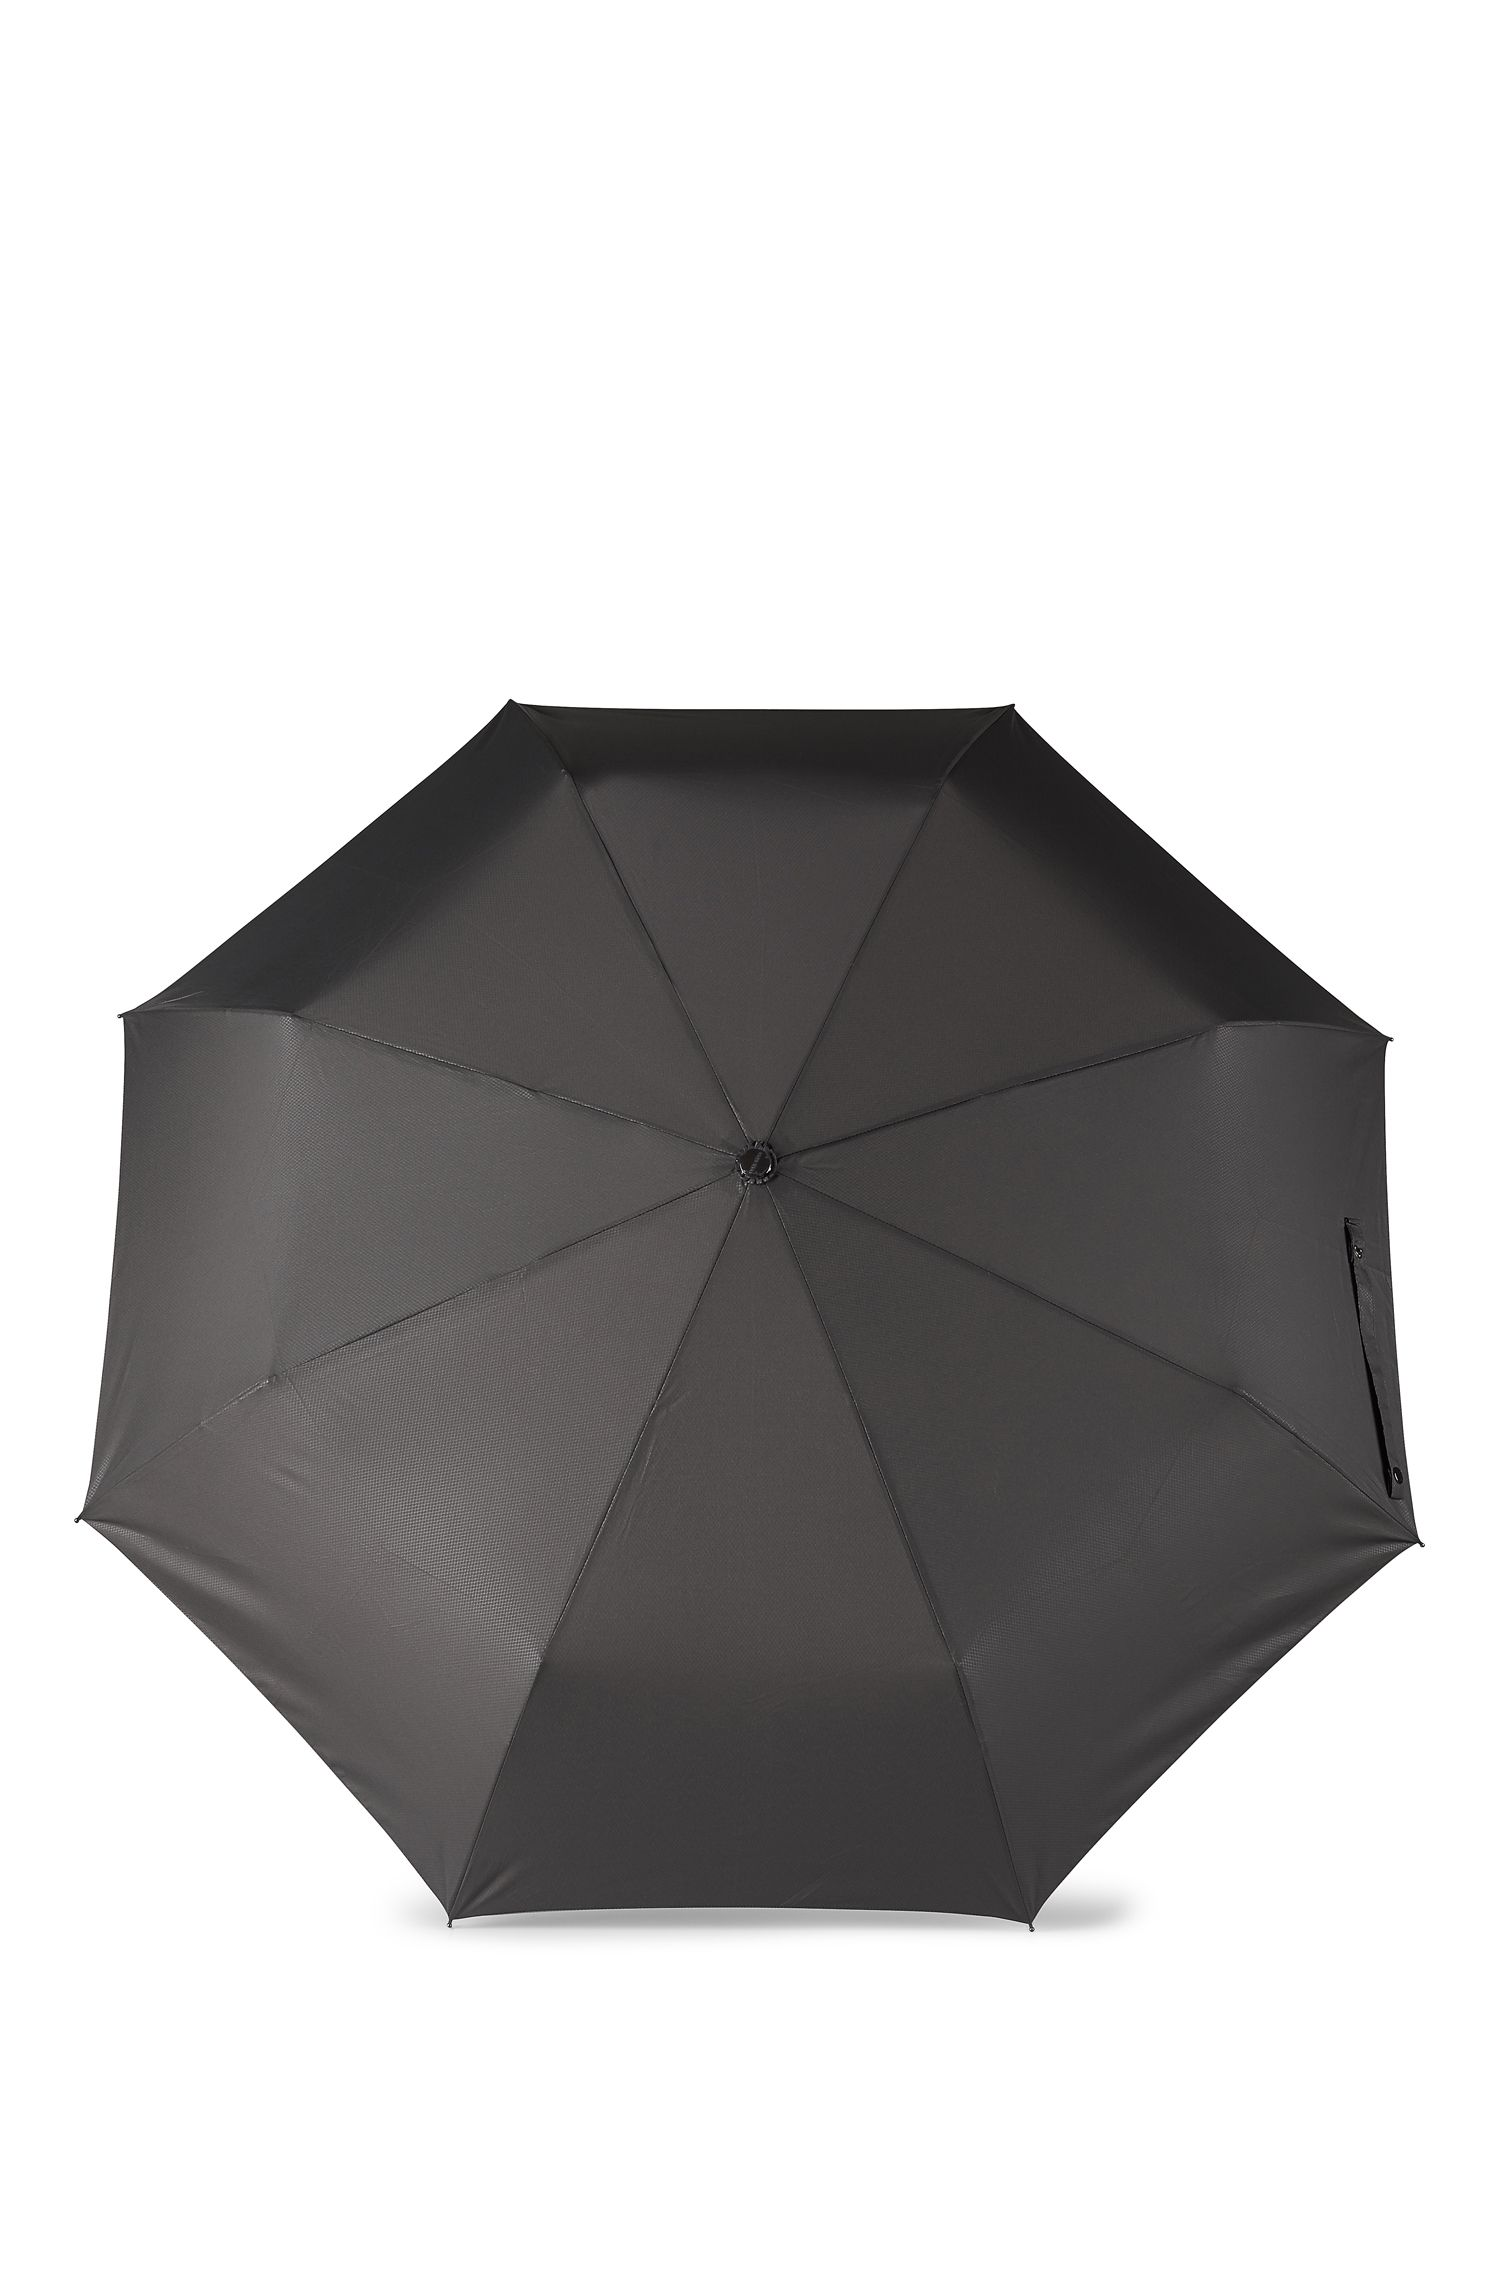 'Umbrella New Loop Dark'   Aluminum Frame Patterned Pocket Umbrella